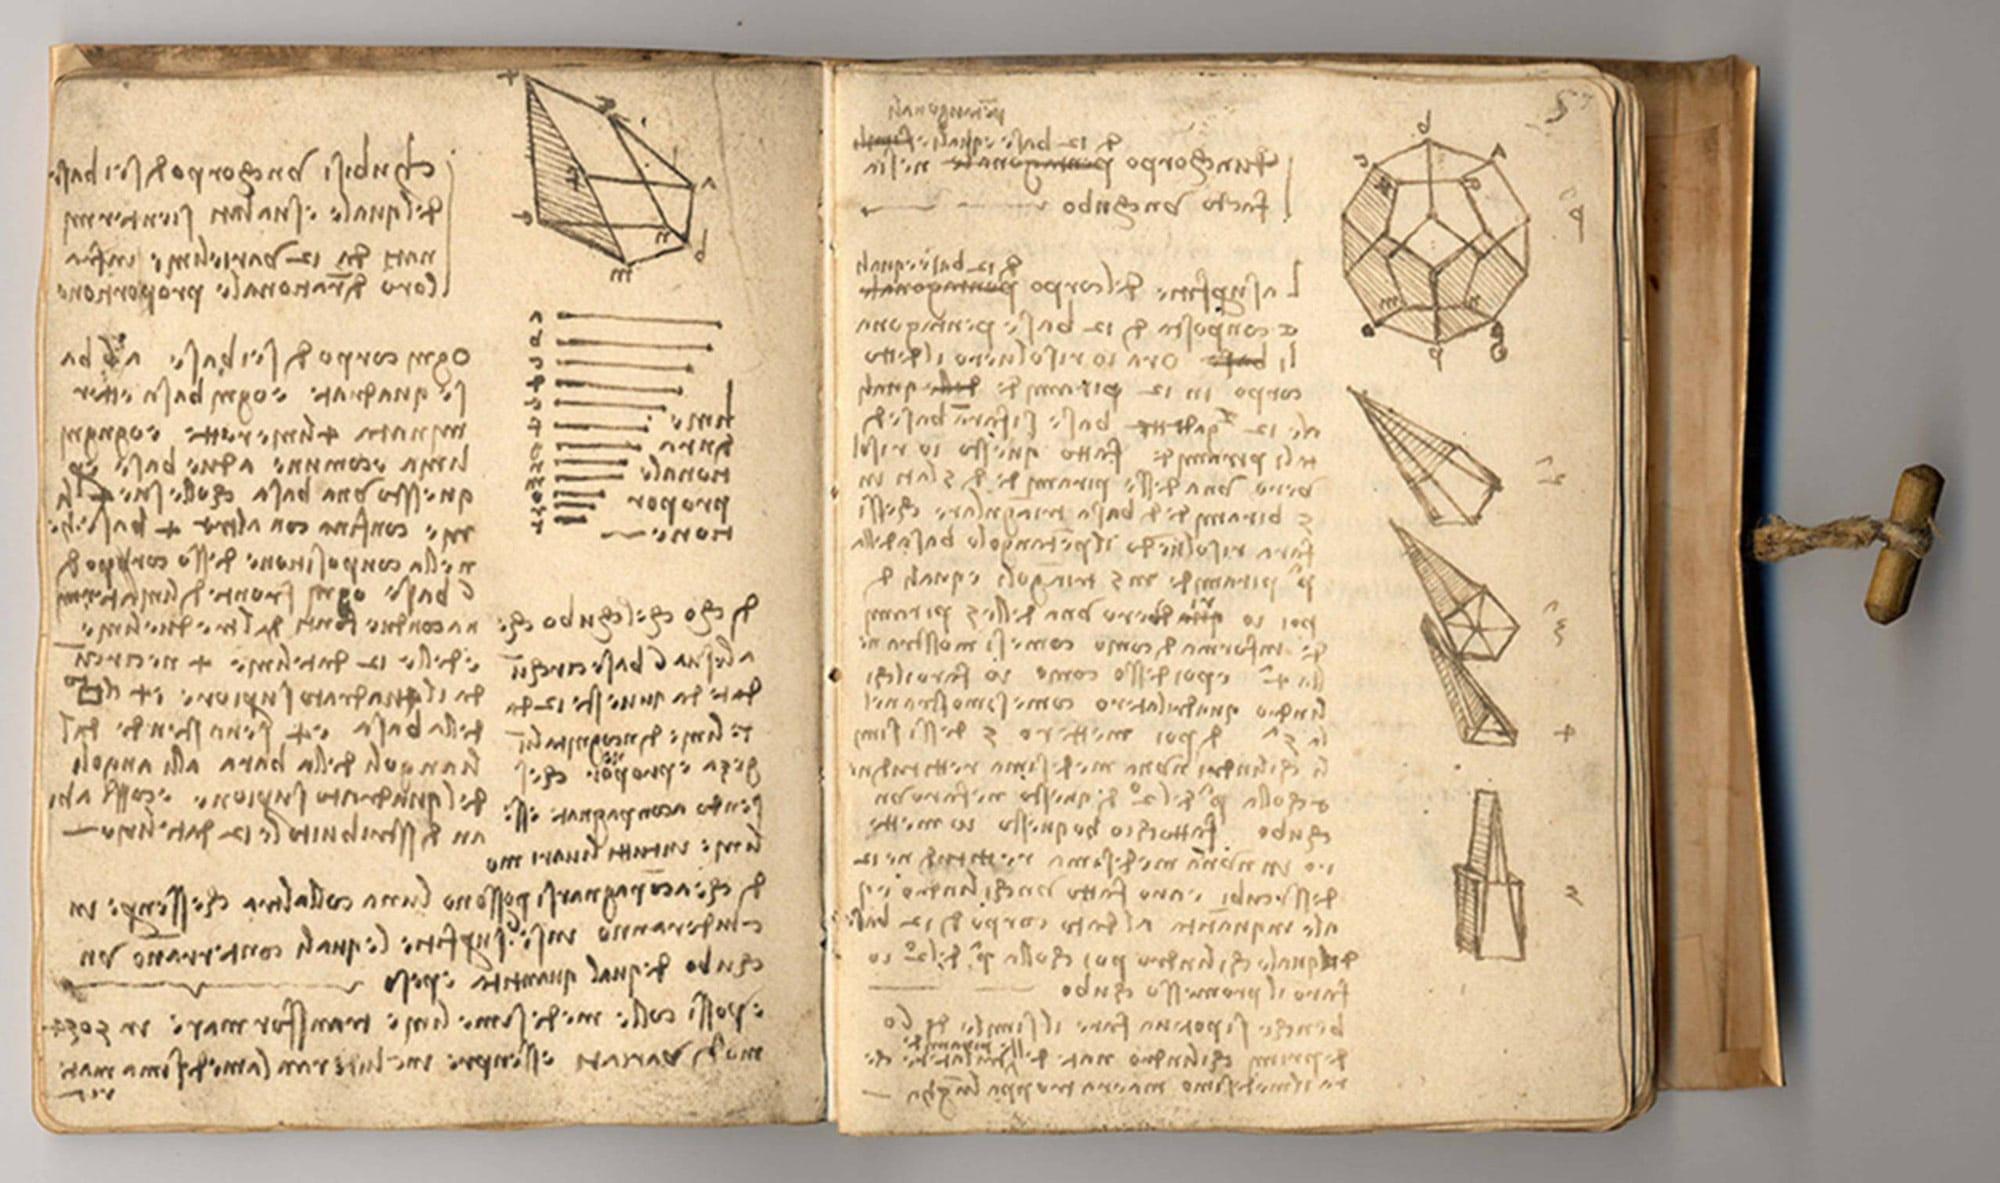 Codex Forster II , Leonardo da Vinci